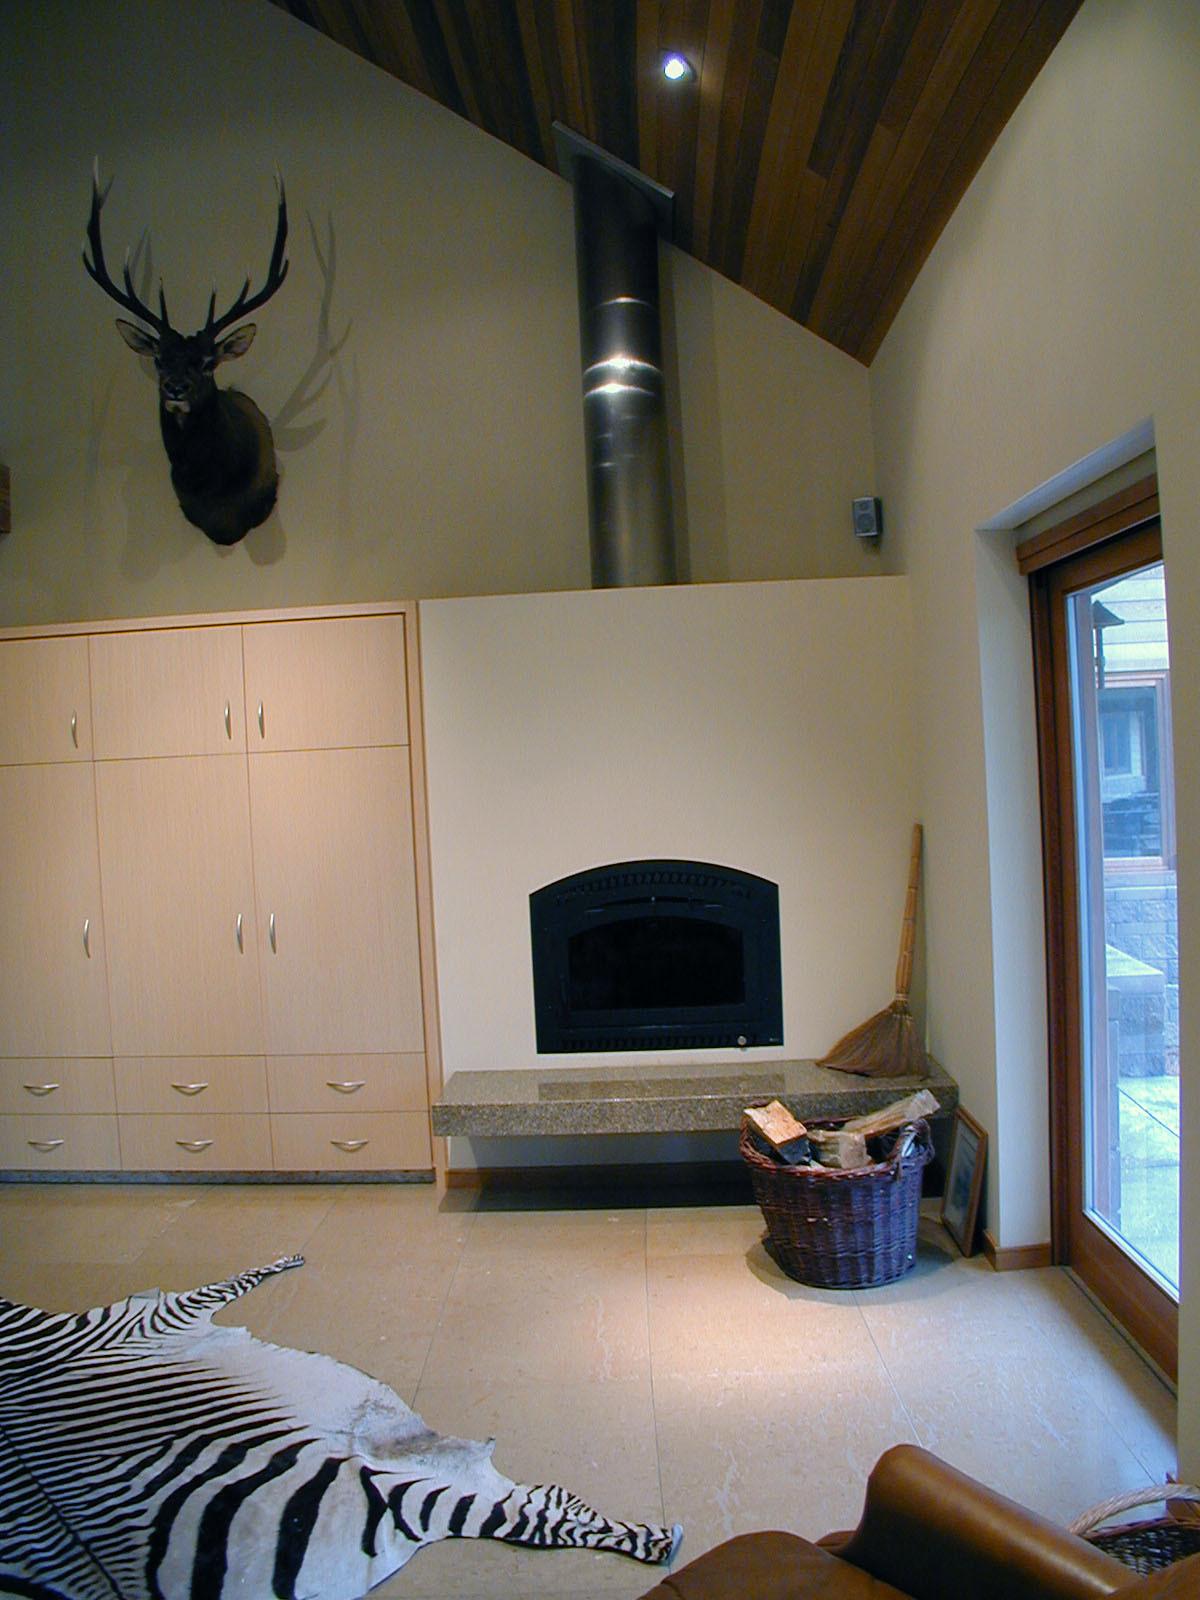 Interior Den Fireplace